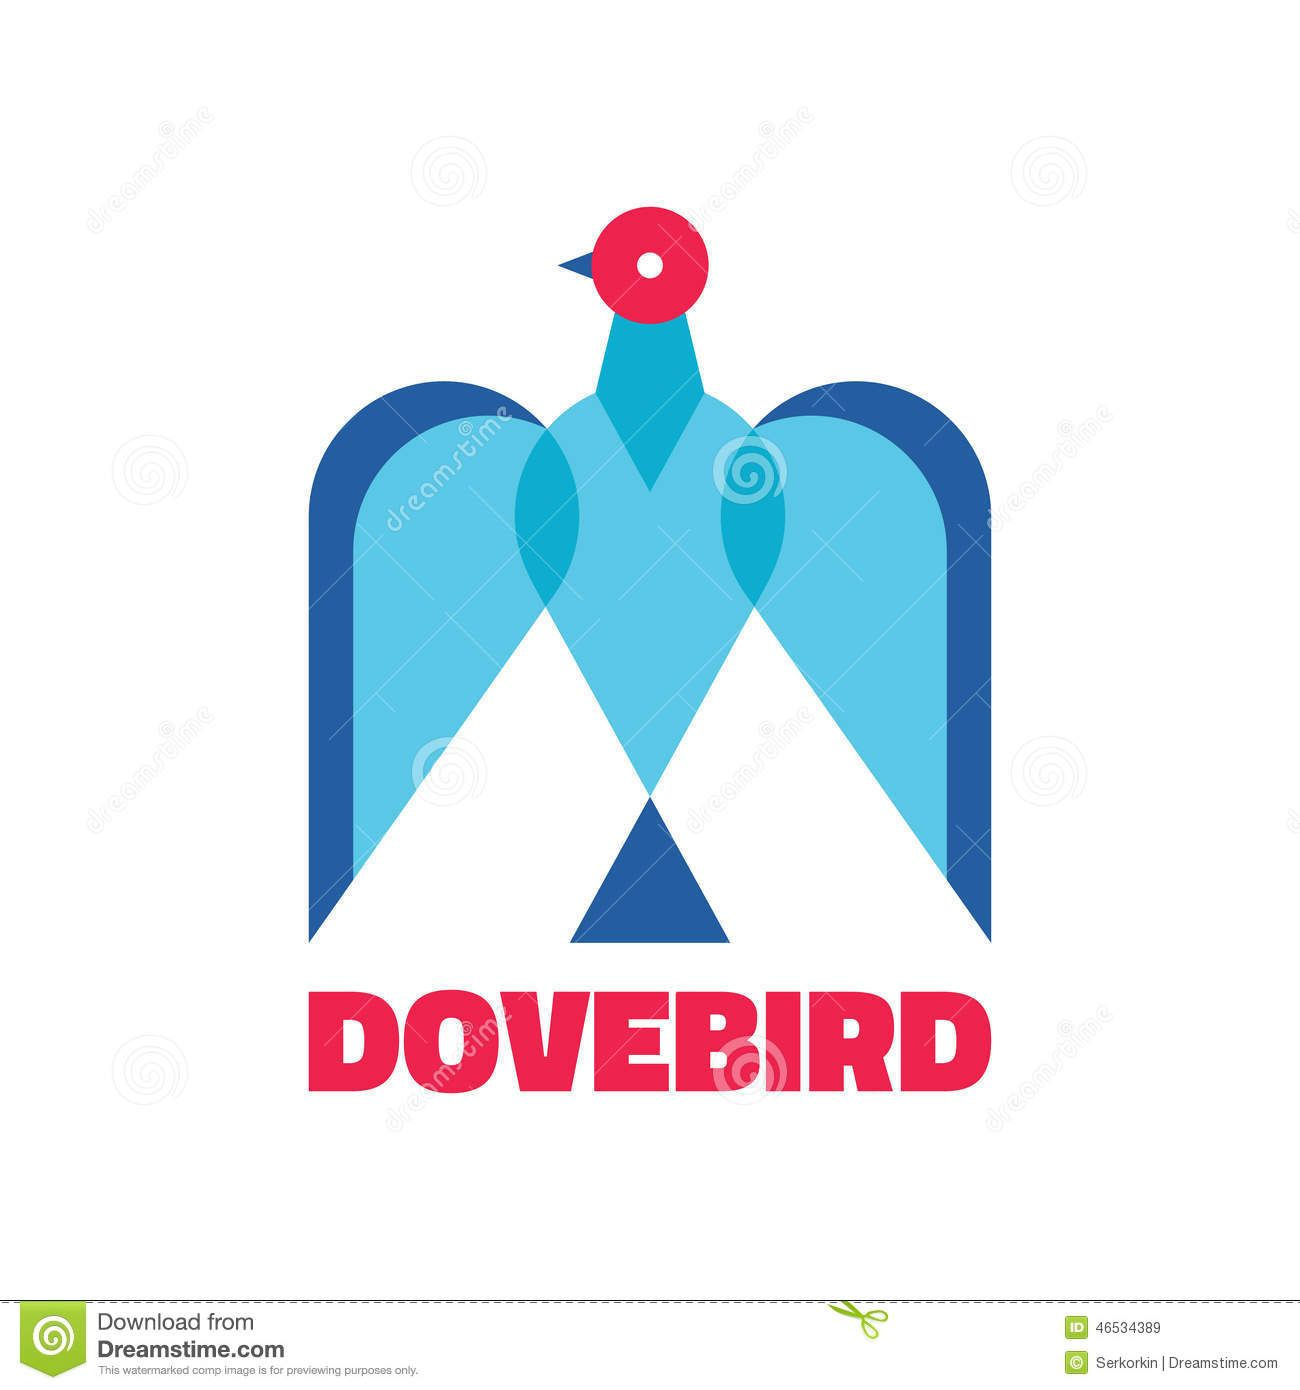 Bird Pigeon Concept Logo Stock Vector - Image: 55055217